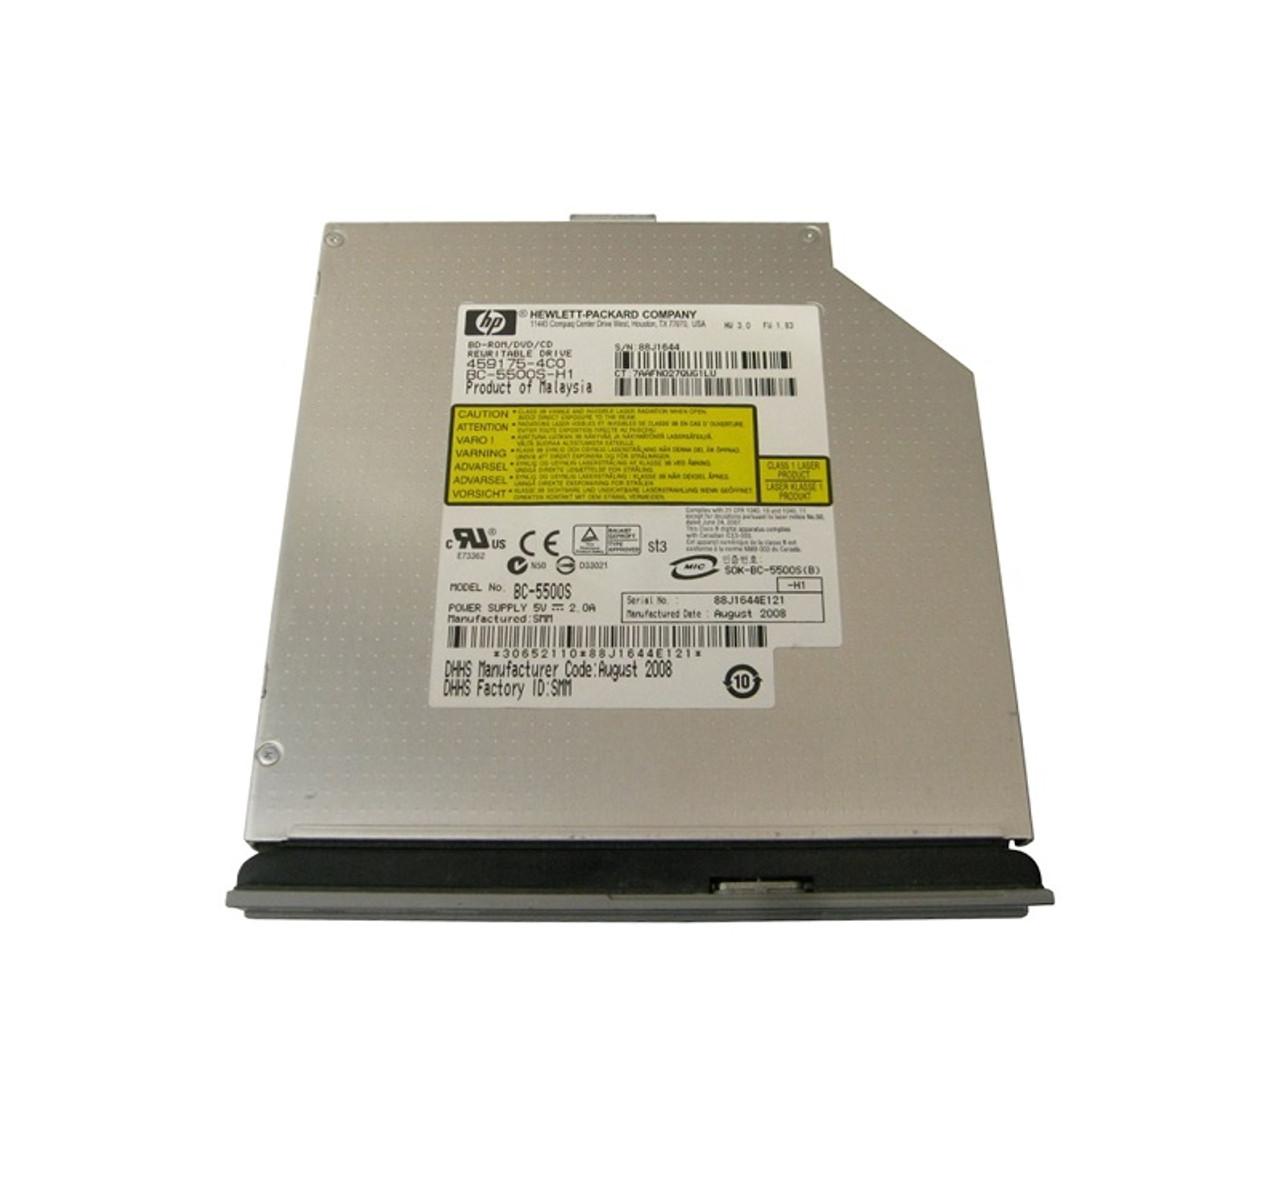 Part No: 498073-001 - HP 2x Blu-Ray Disc (BD) 8x DVD+/-RW SATA Super-Multi  Double Layer Optical Drive